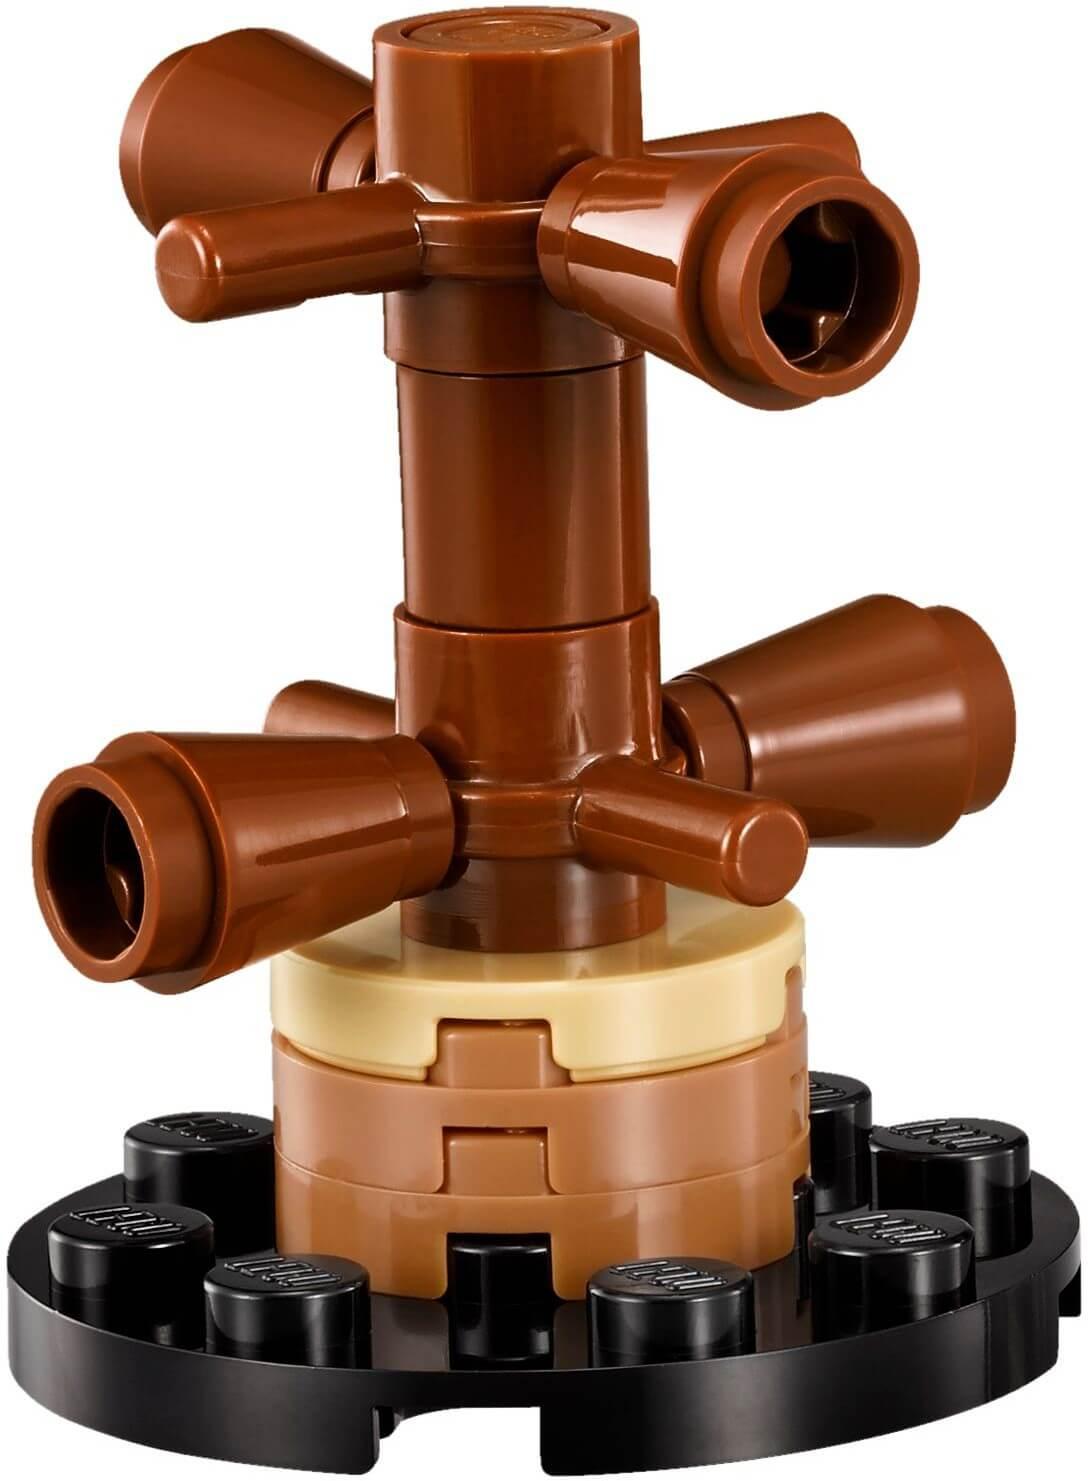 Mua đồ chơi LEGO 70606 - LEGO Ninjago 70606 - Phòng Tập Võ Spinjitzu (LEGO Ninjago Spinjitzu Training)